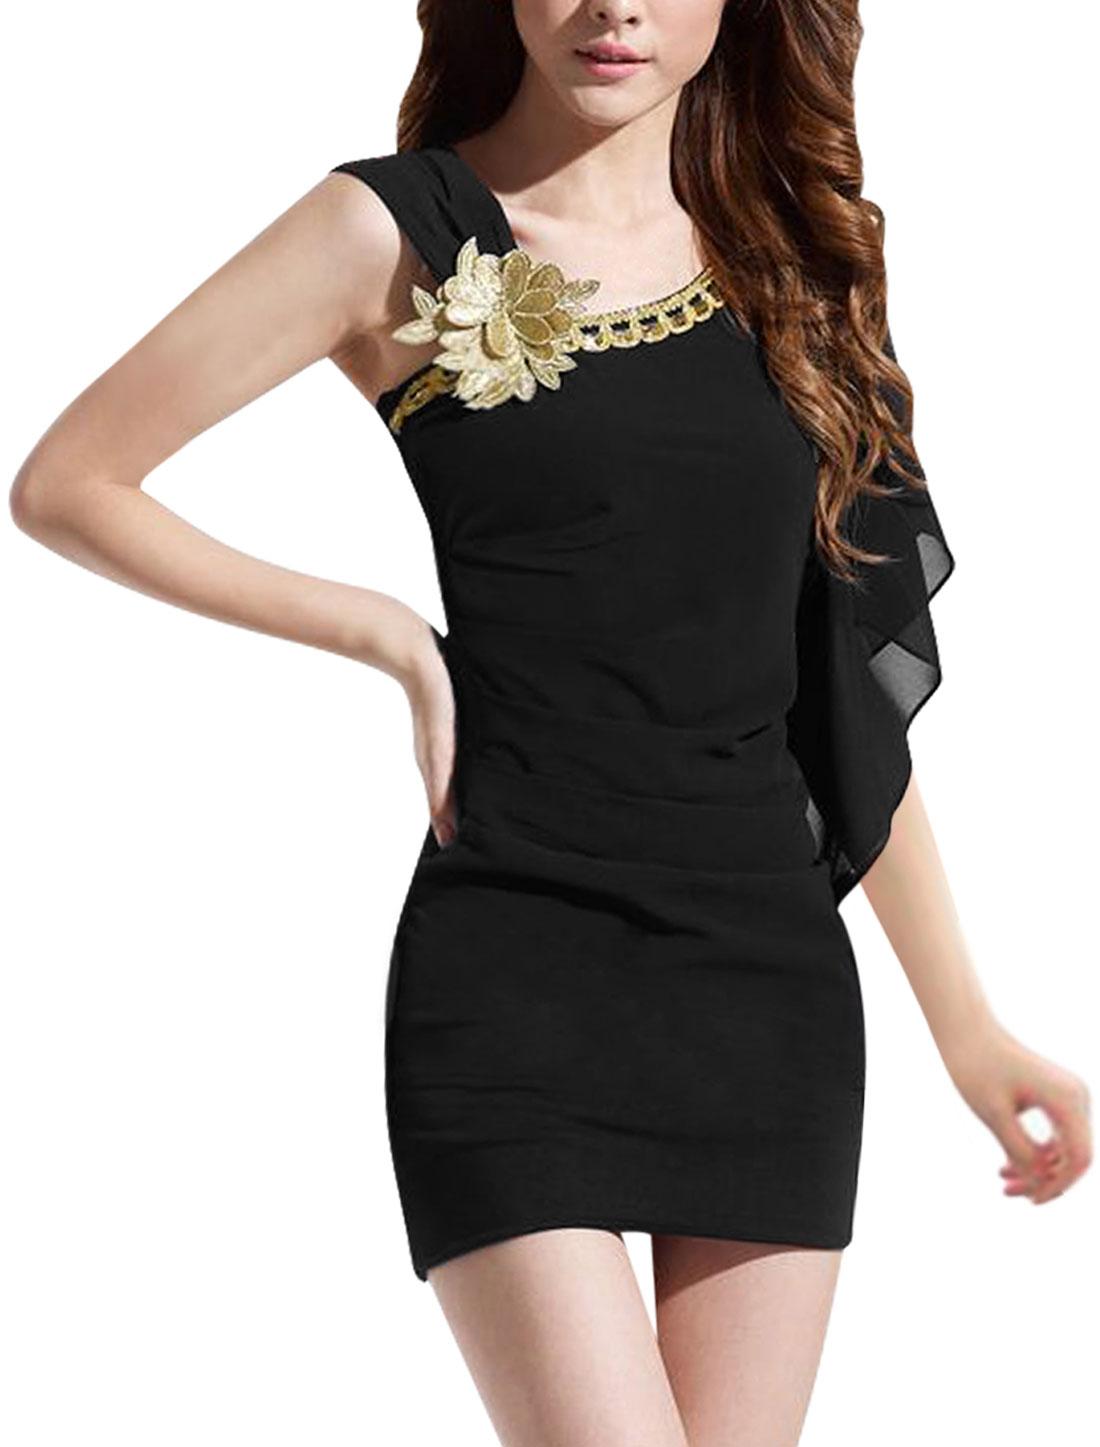 Women Asymmetric Sleeve Shirr Design Above Knee Sheath Dress Black XS